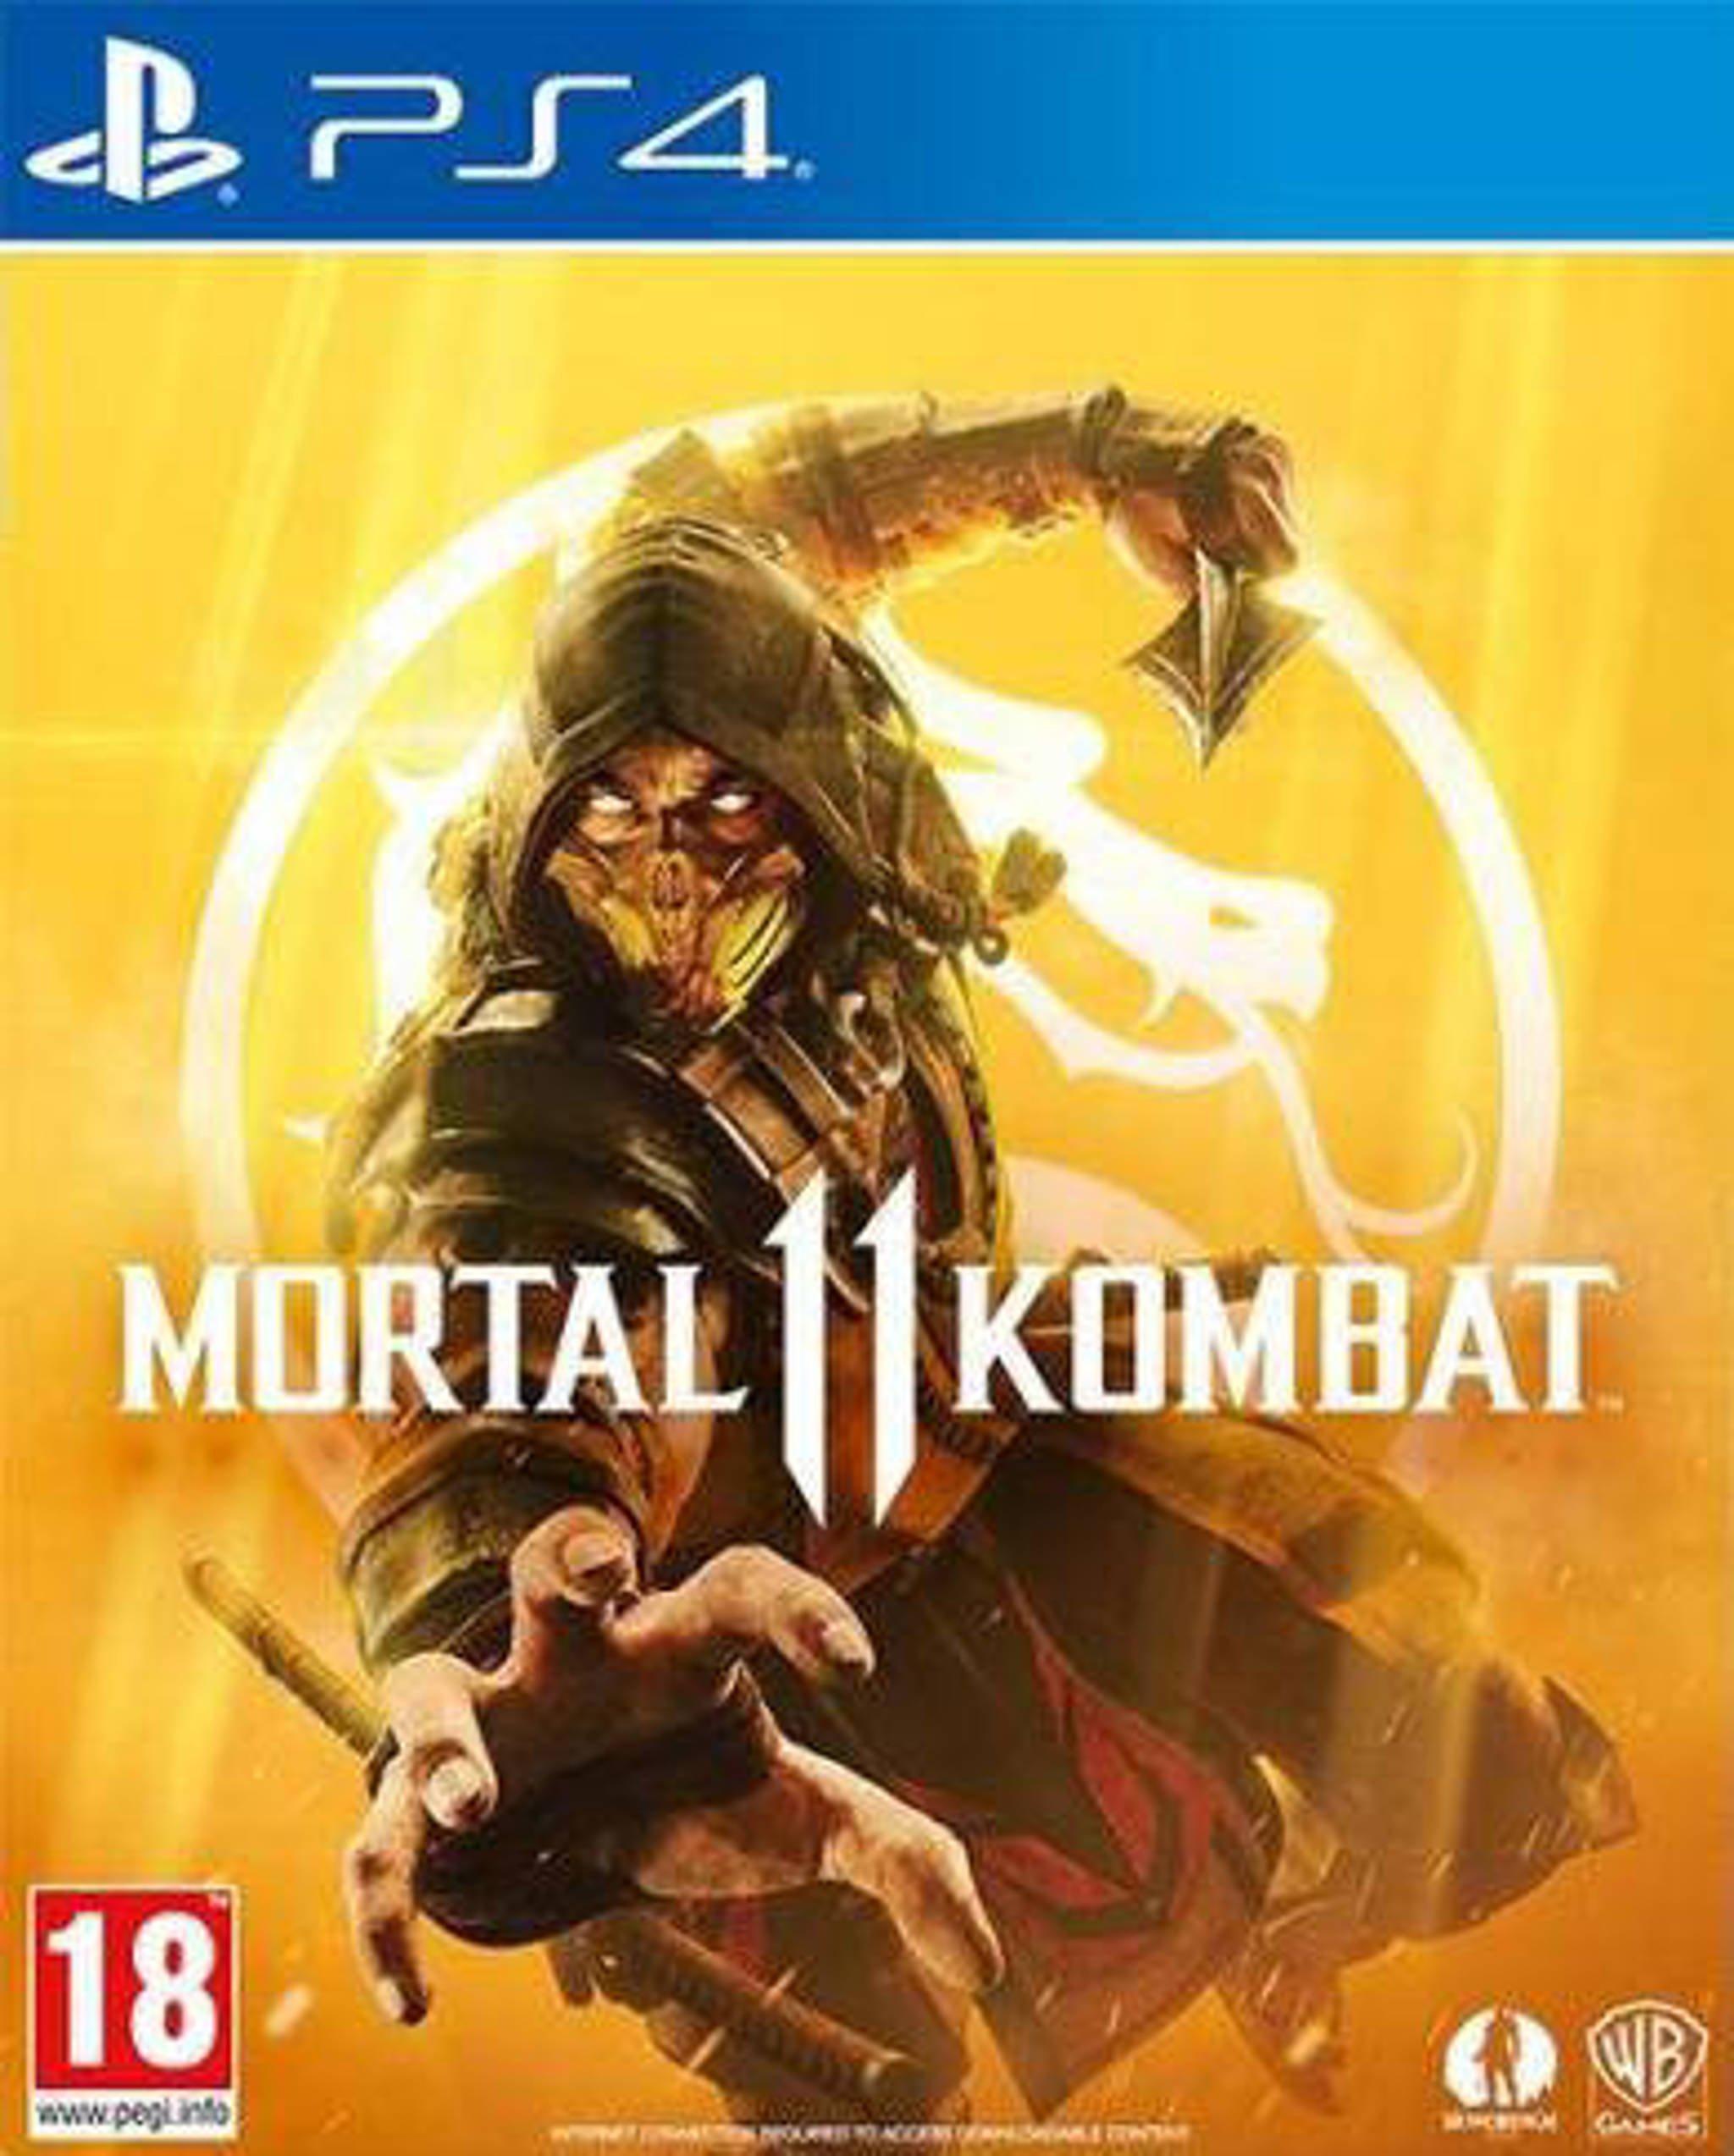 Mortal kombat 11 (PS4) @ Wehkamp